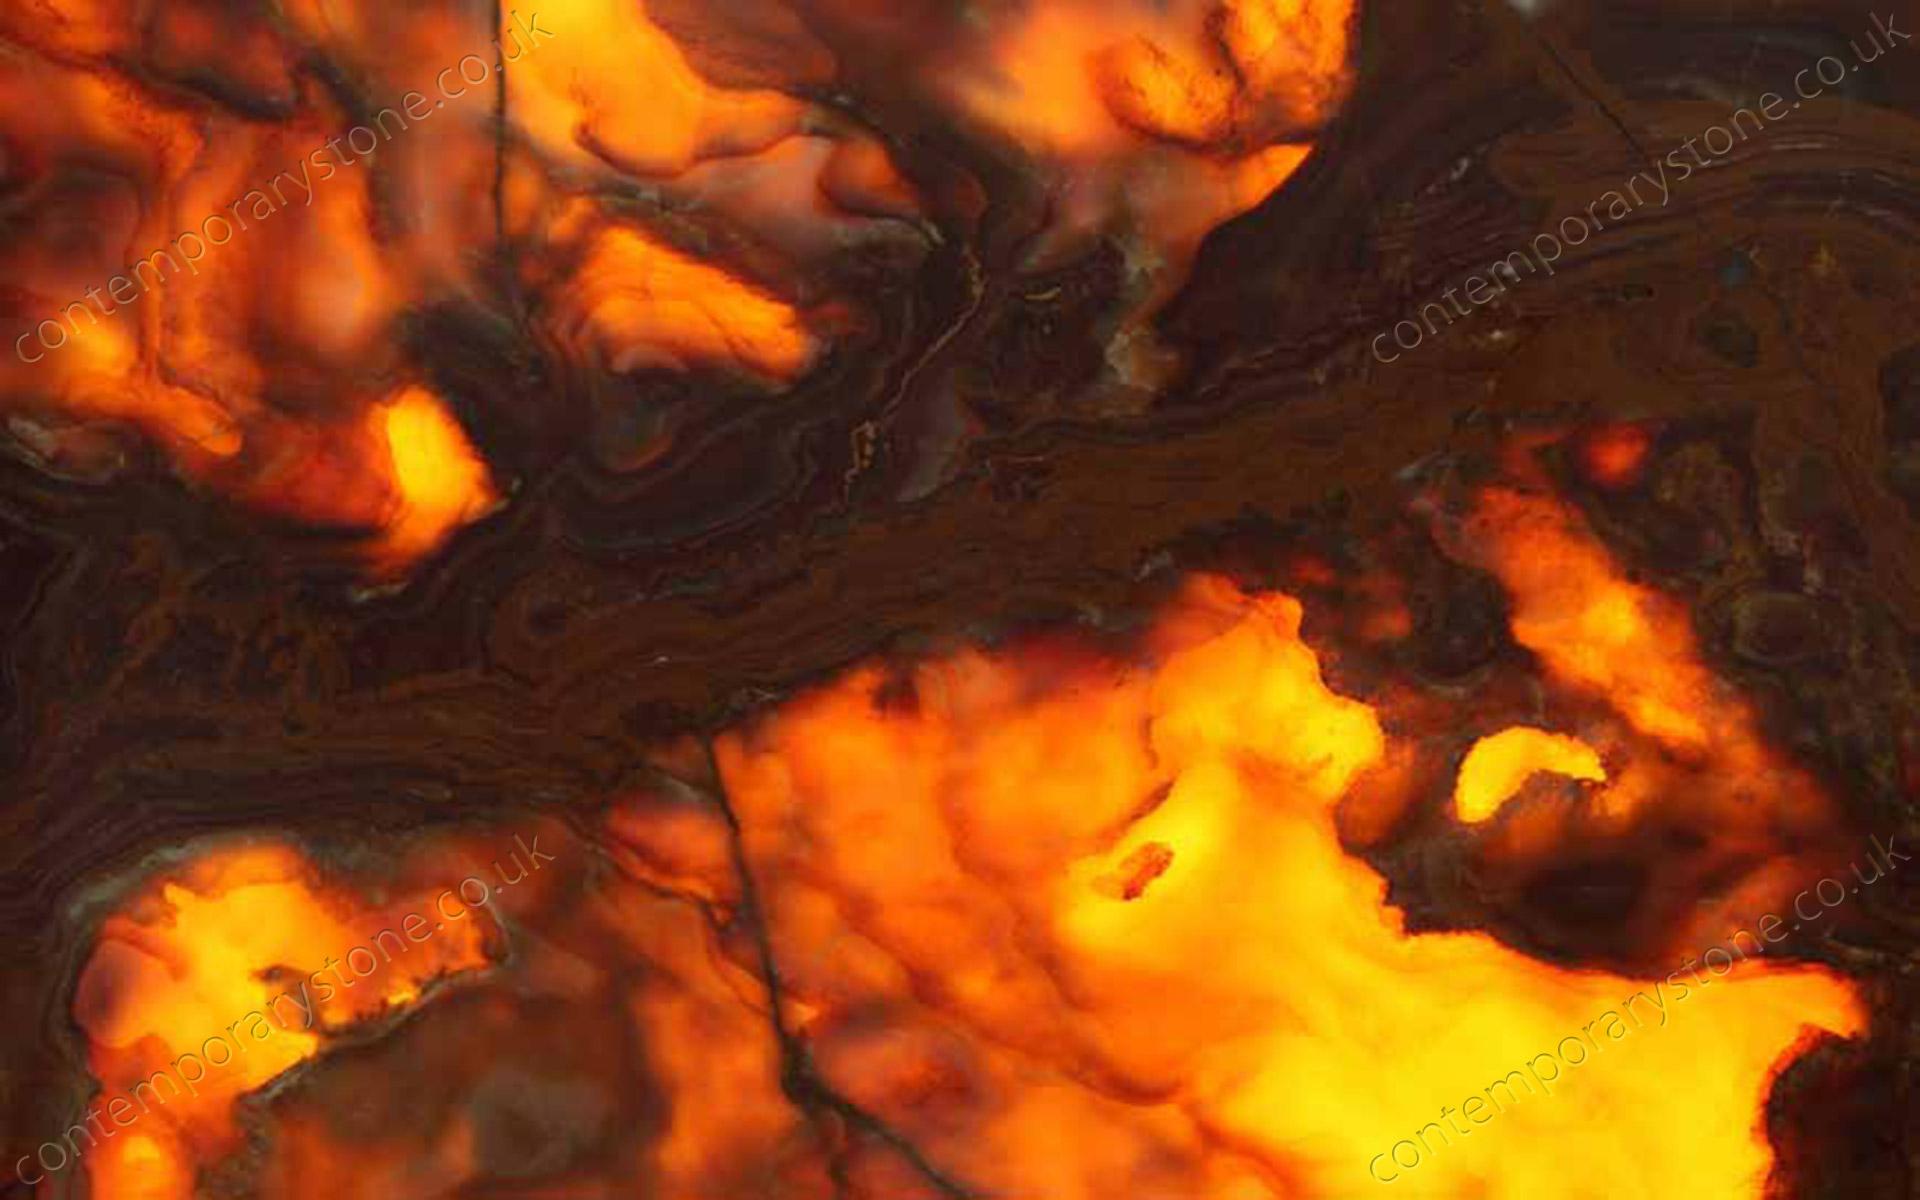 Onice Tiger cc backlight onyx close-up